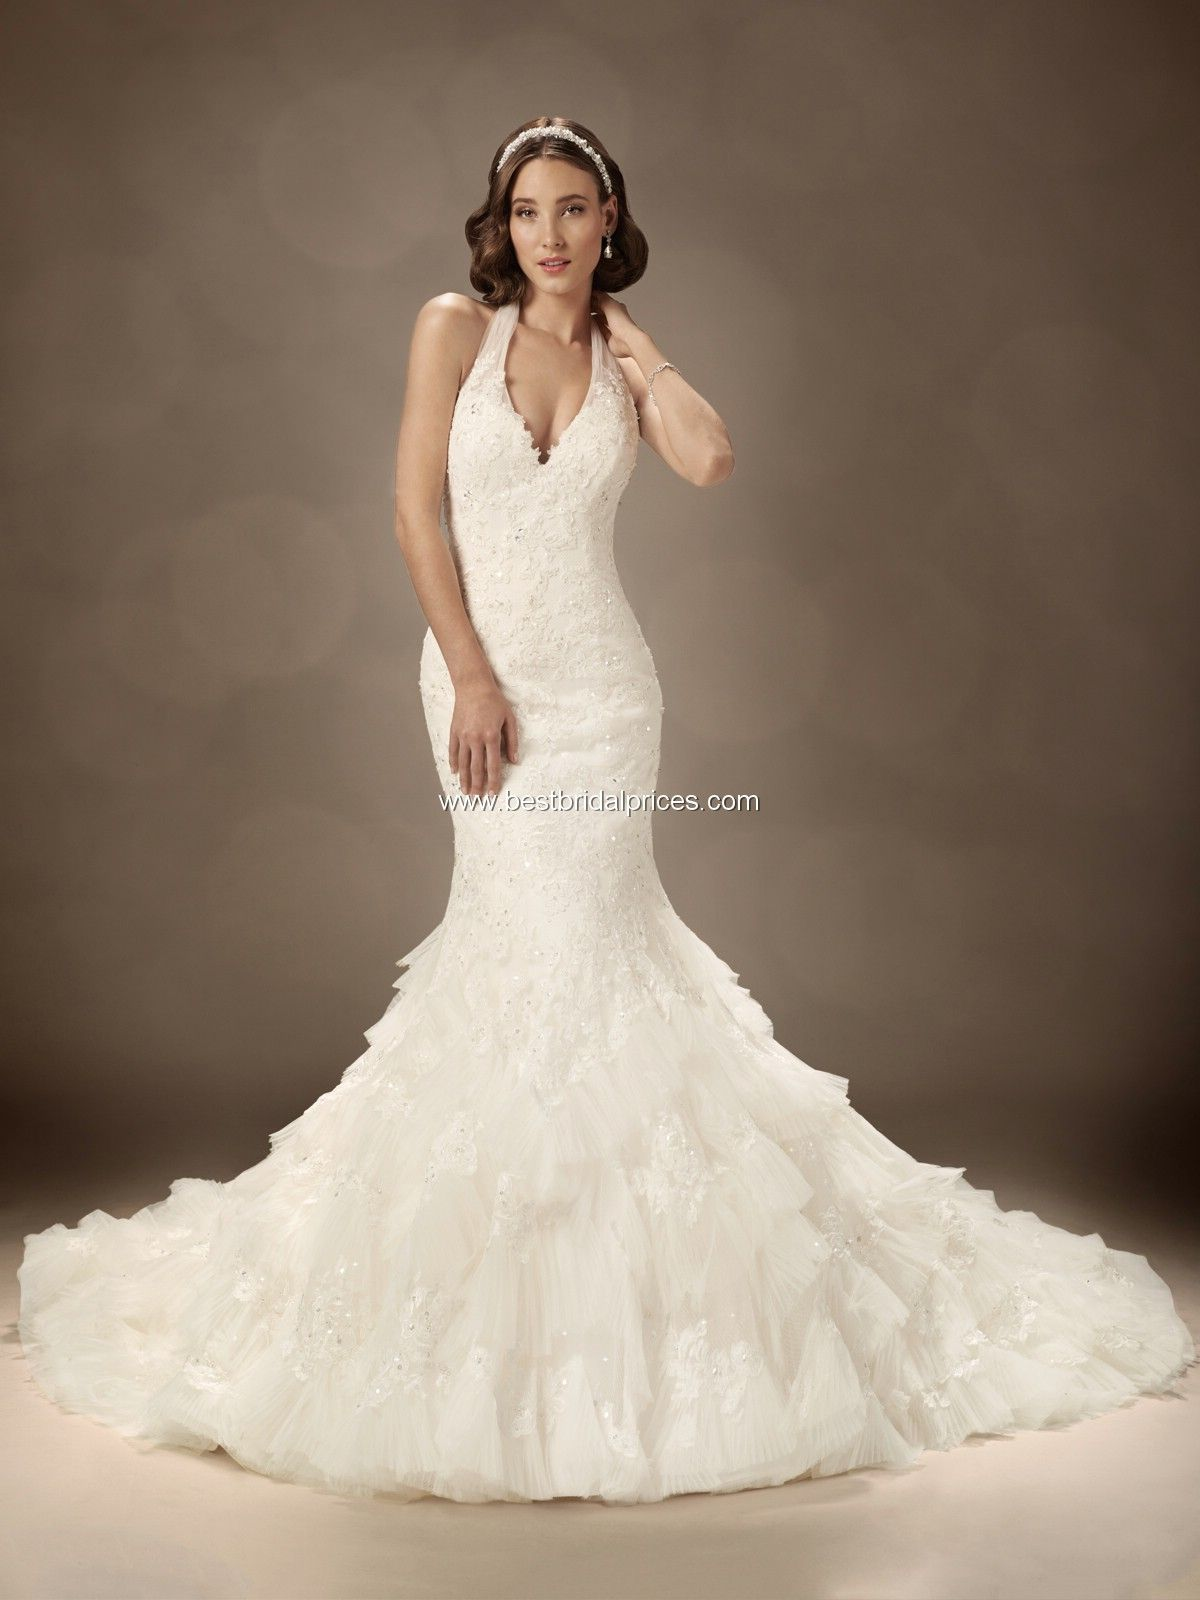 Sophia tolli wedding dresses style tribute y wedding ideas